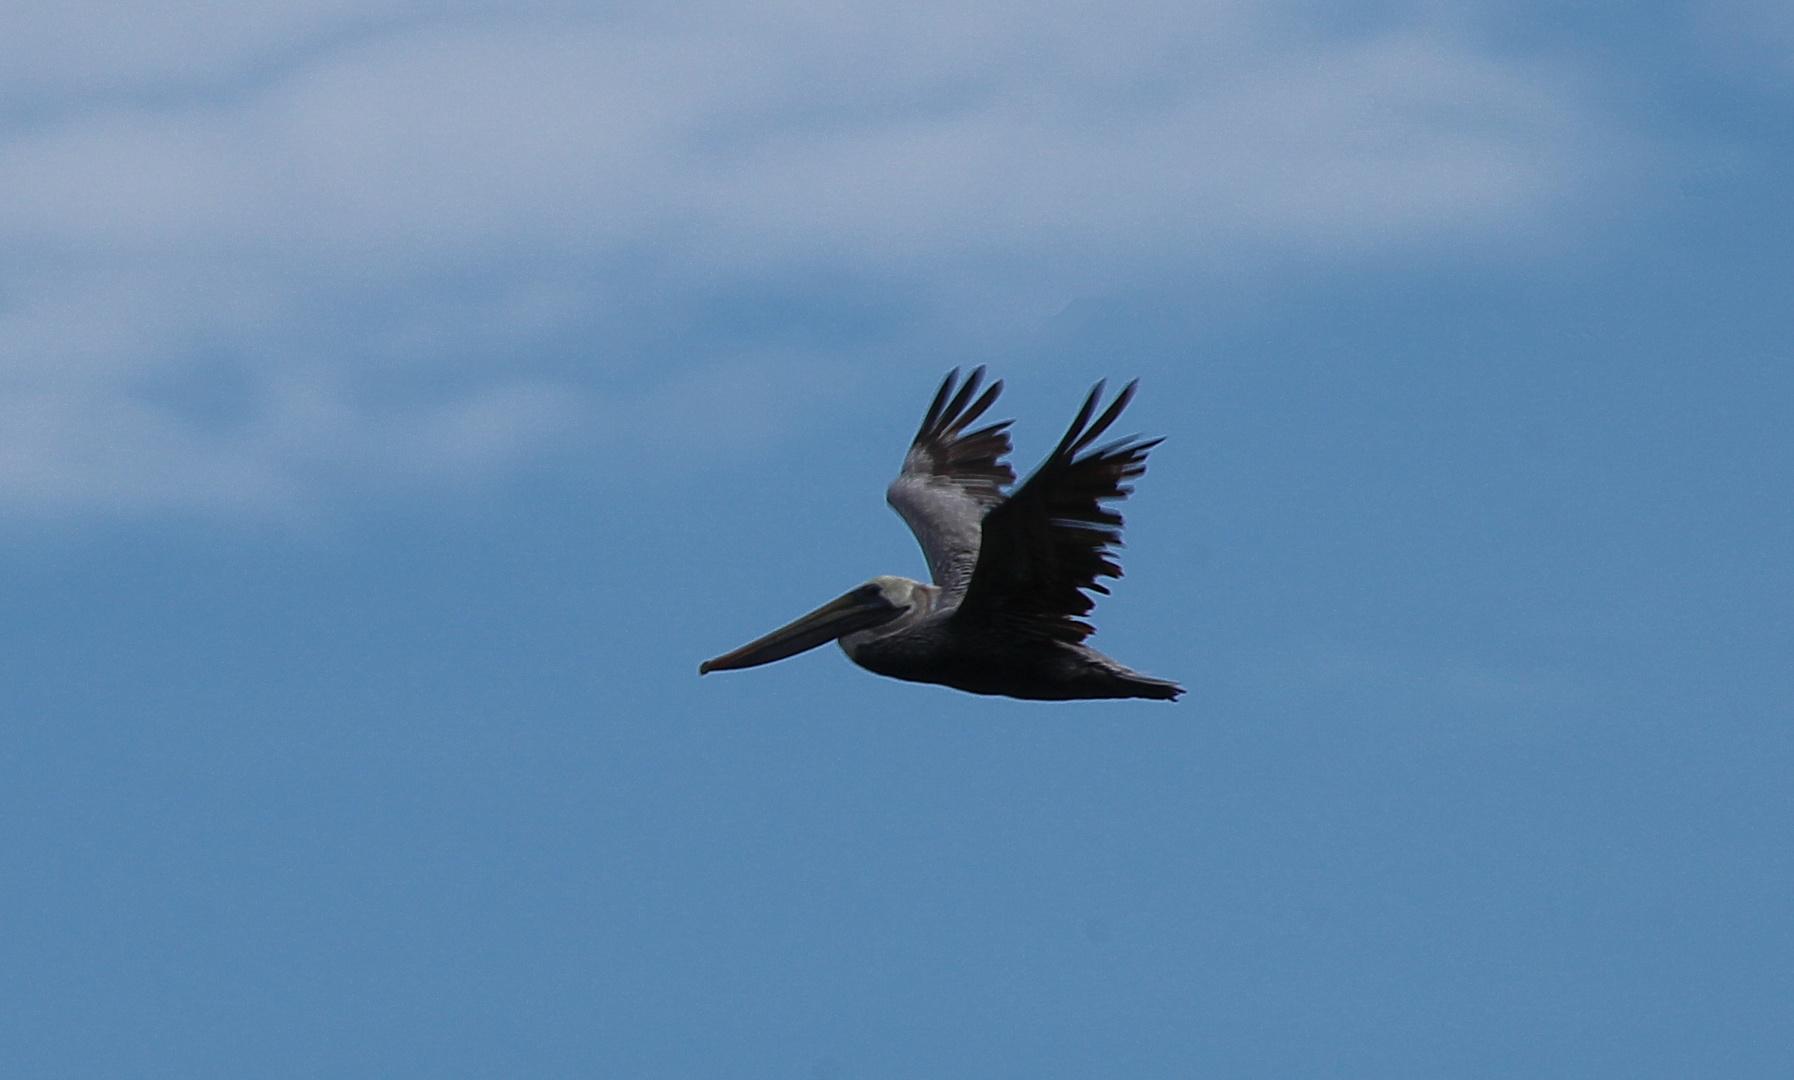 Begegnung mit dem Pelikan